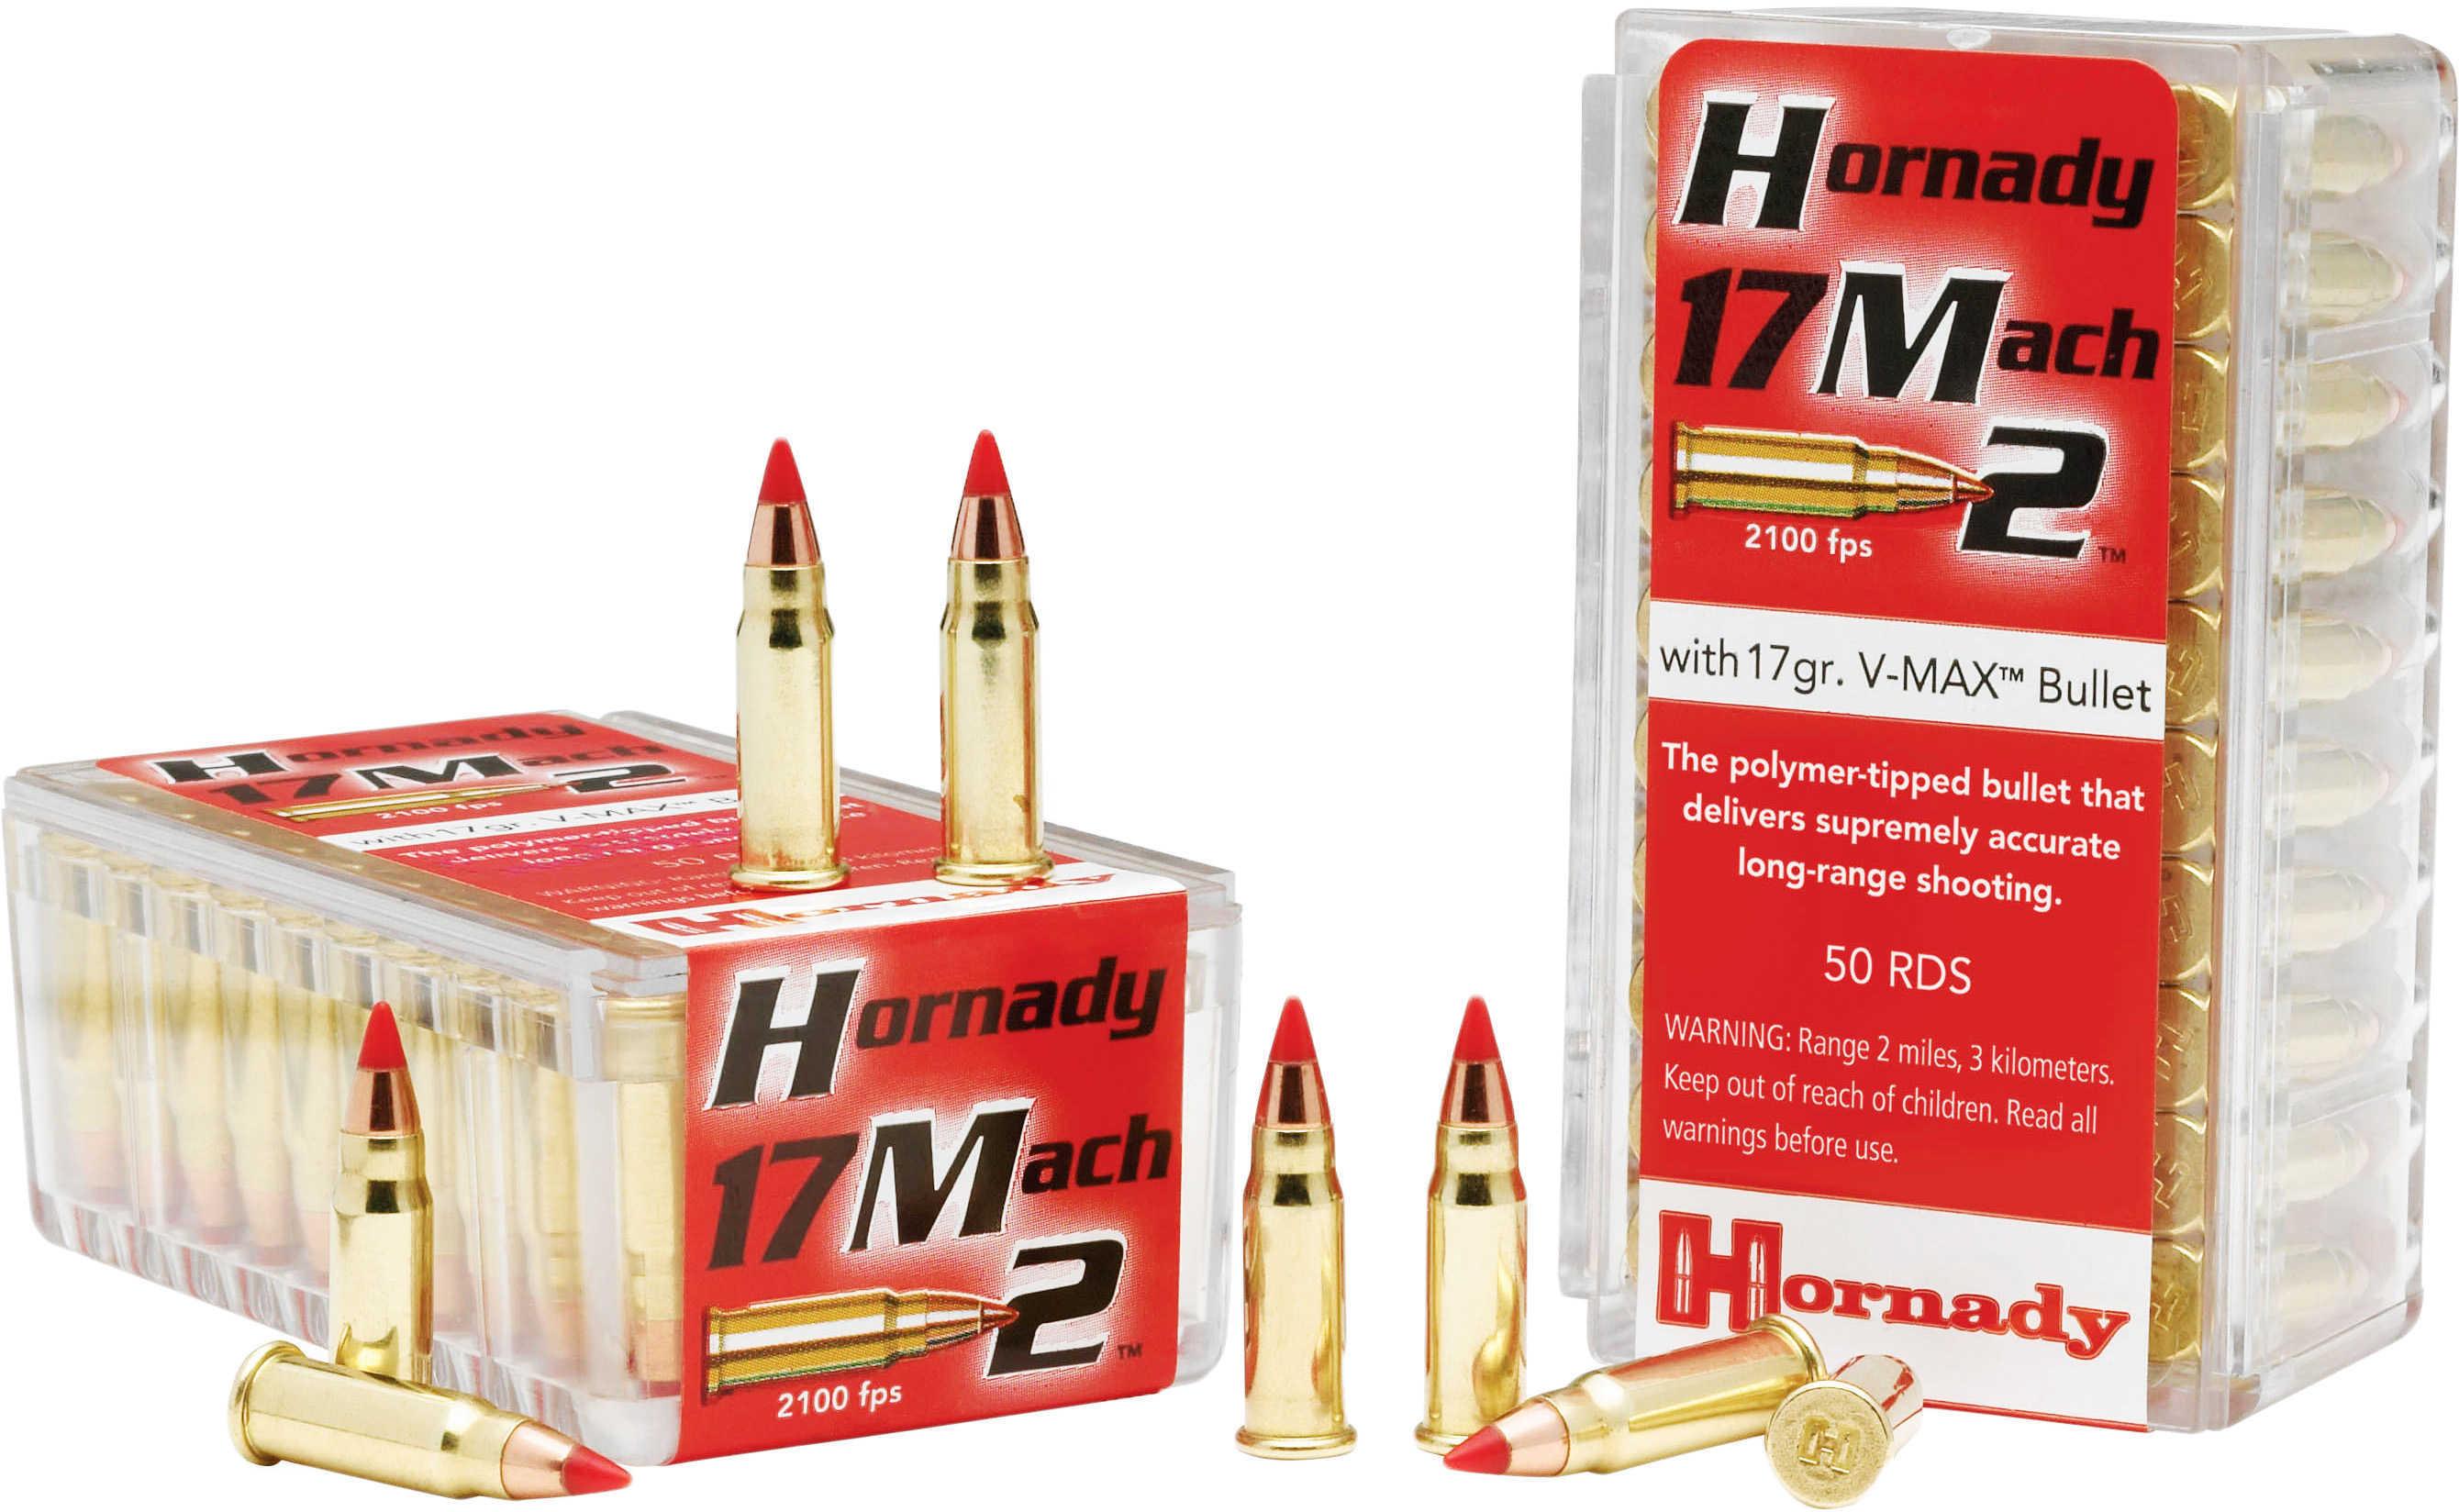 Hornady Varmint Express Ammunition 17 Mach-2 17 Grain V-Max 50Bx Size 17 Mach2/17Gr/V-Max